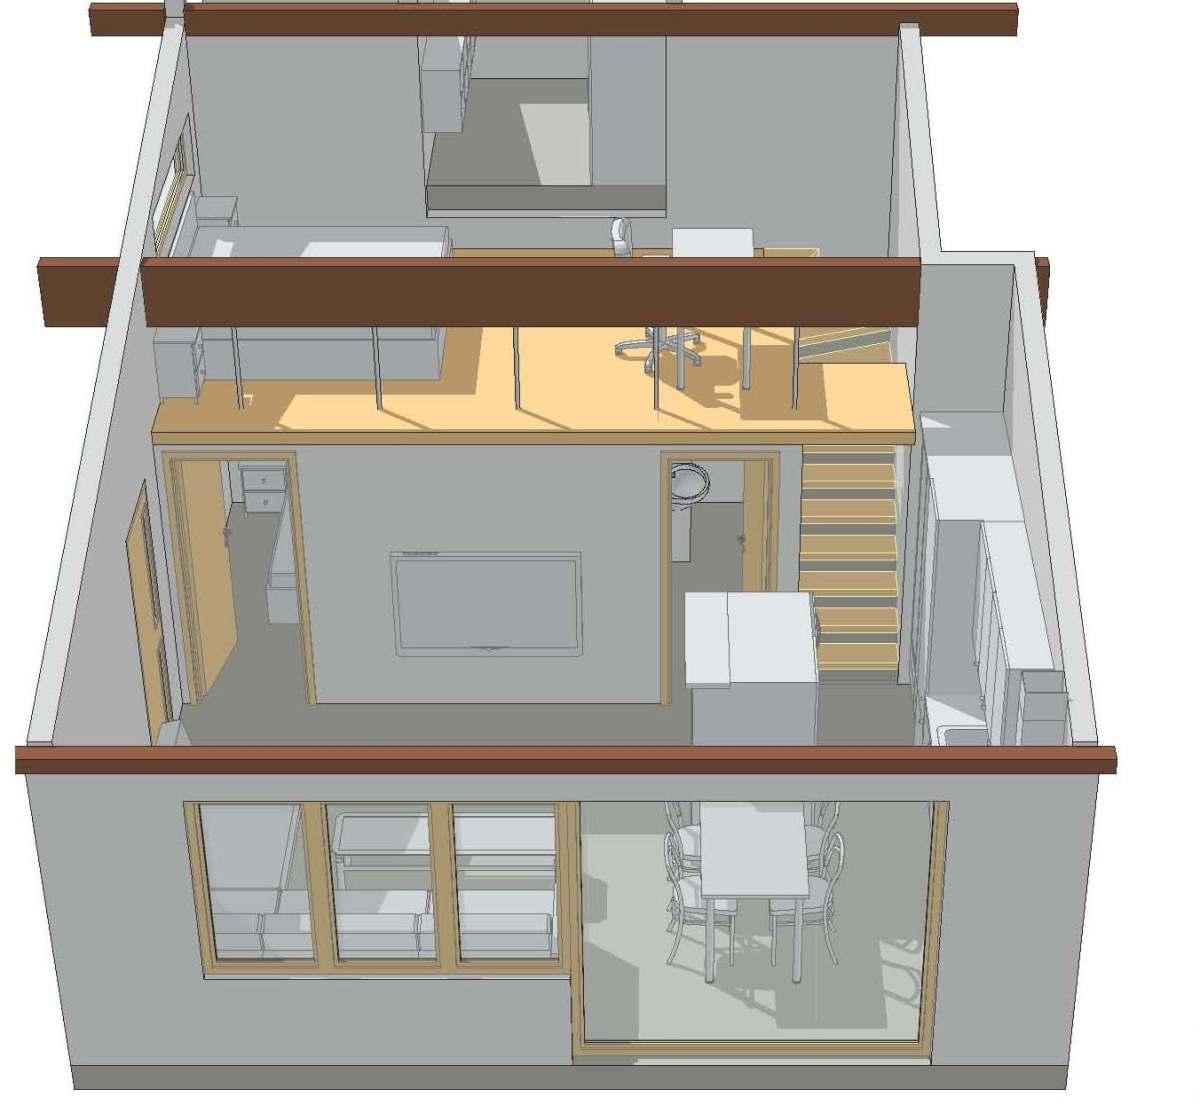 Transformation garage en studio v senaz - Transformation garage en logement ...